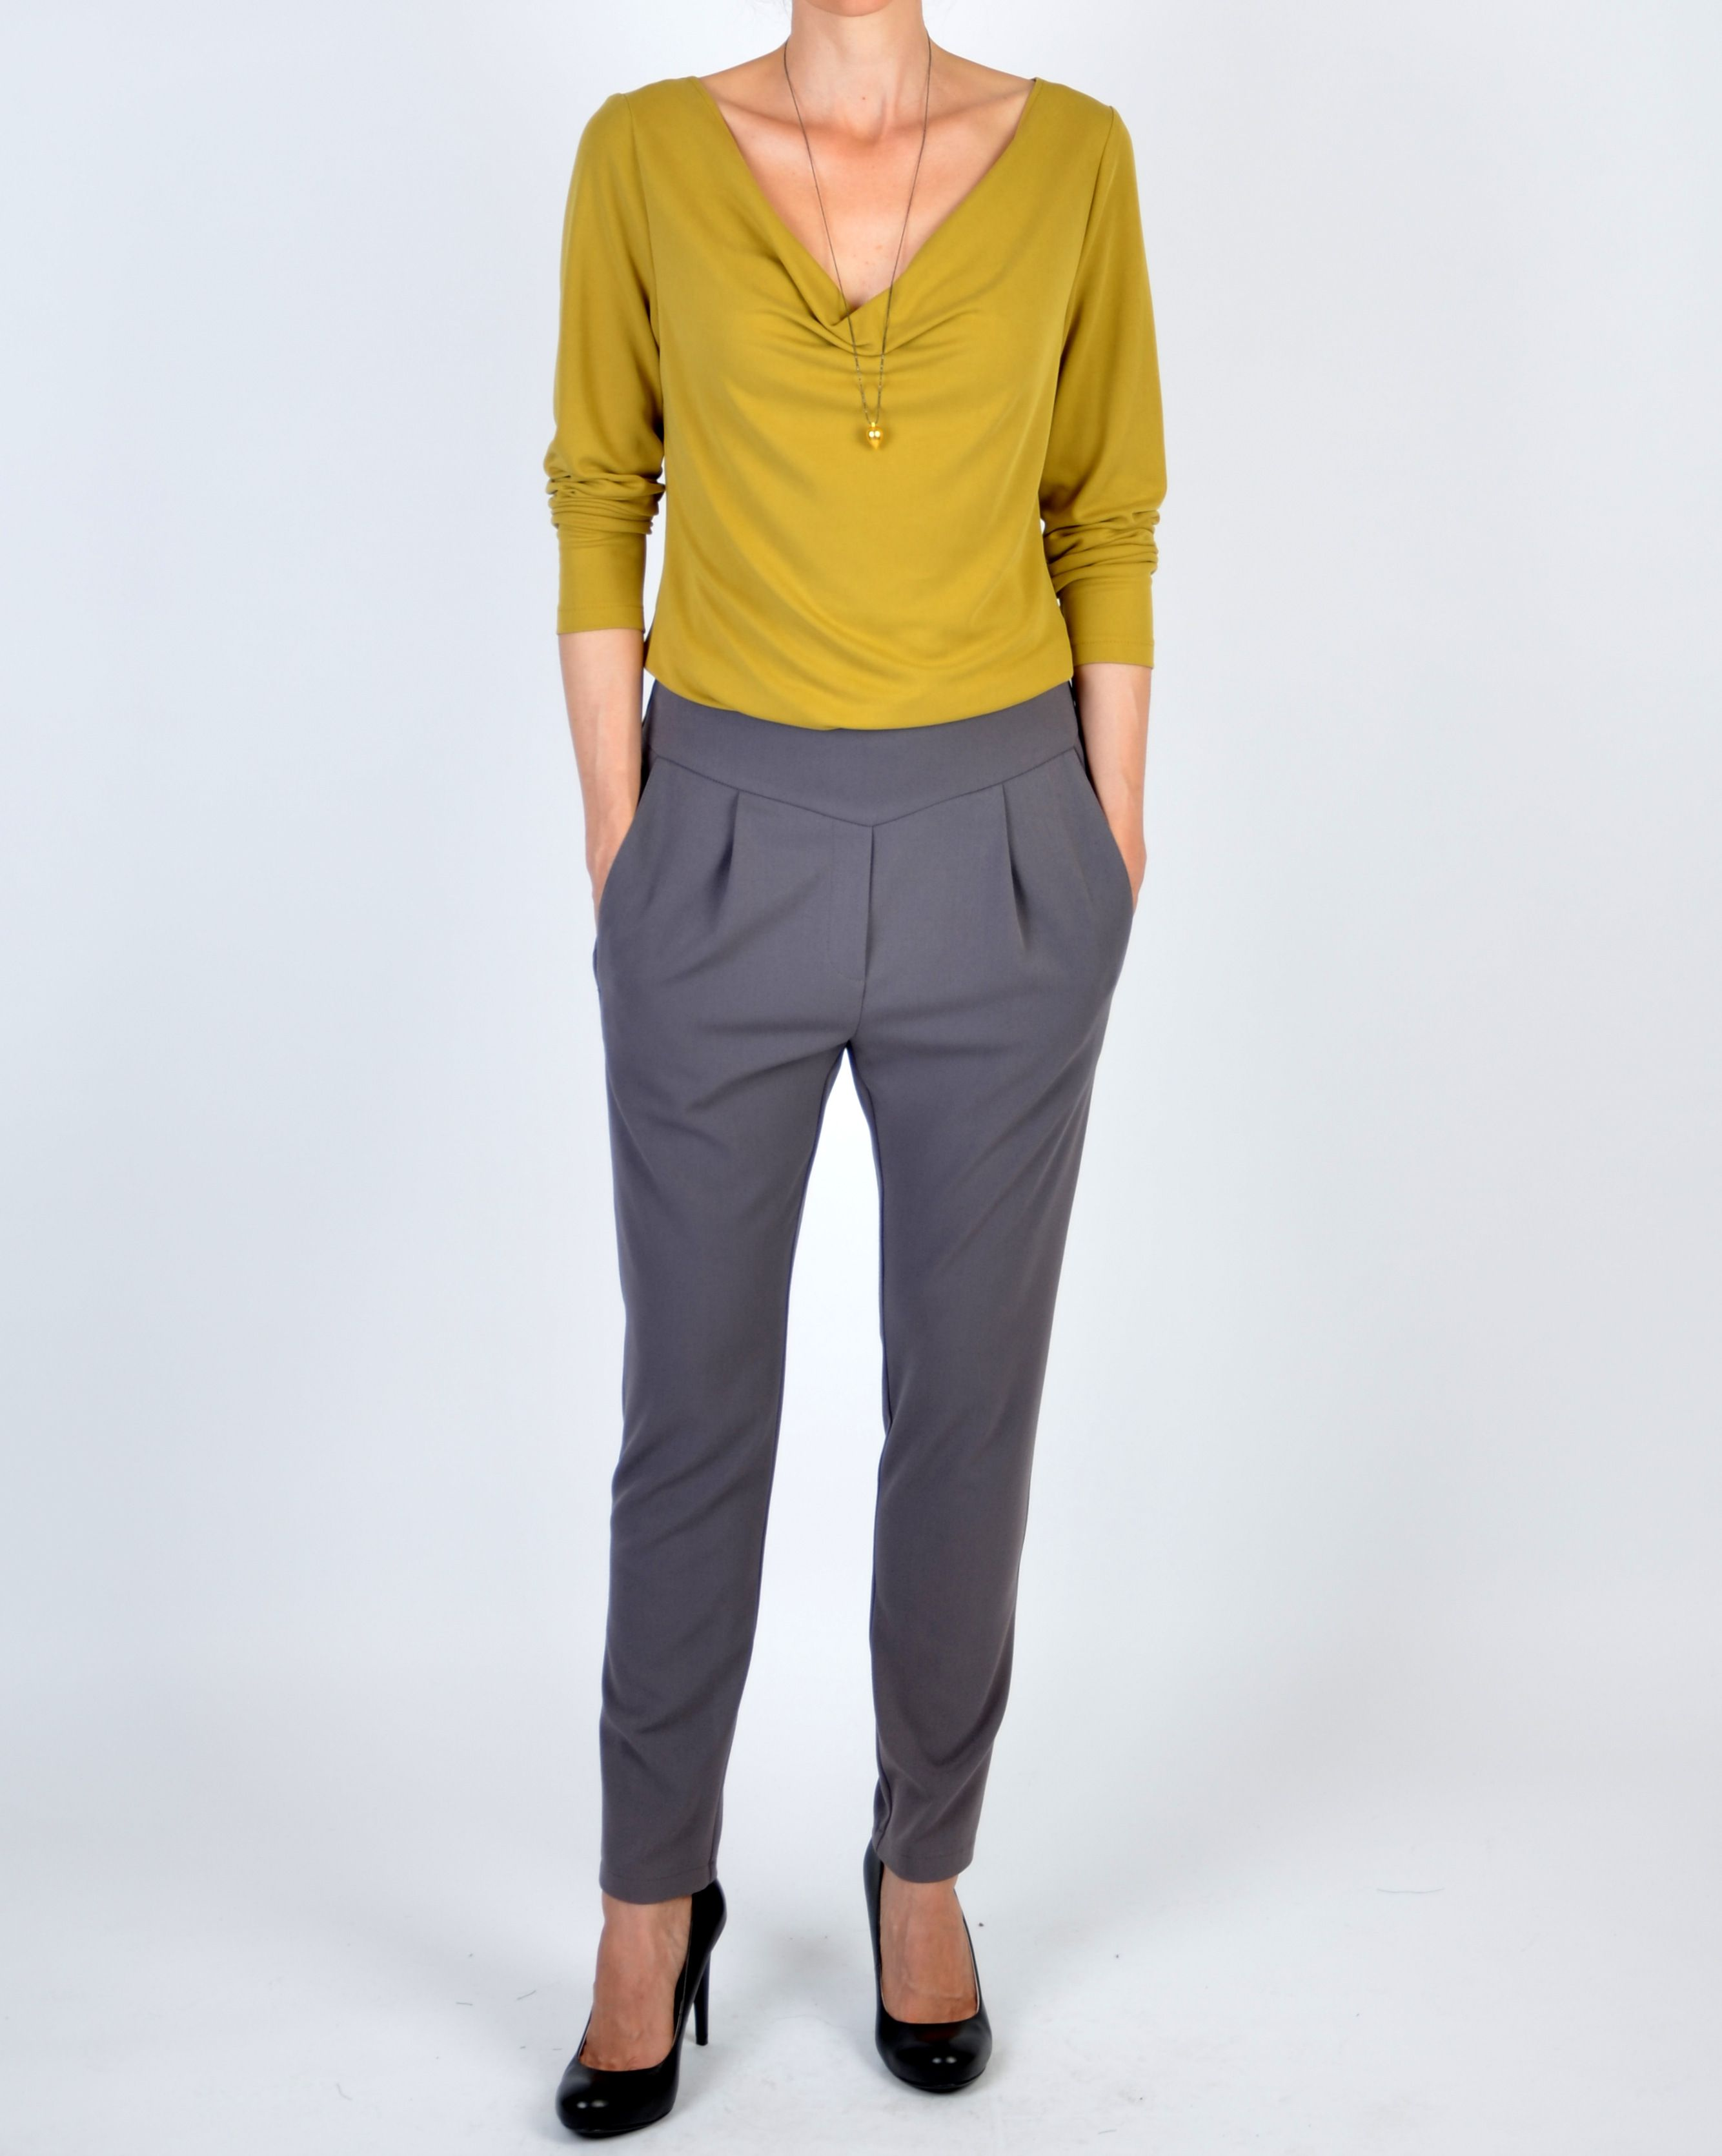 Amina bukser 1599. EFTERÅR-VINTER 2016 | Mette Bredahl Design